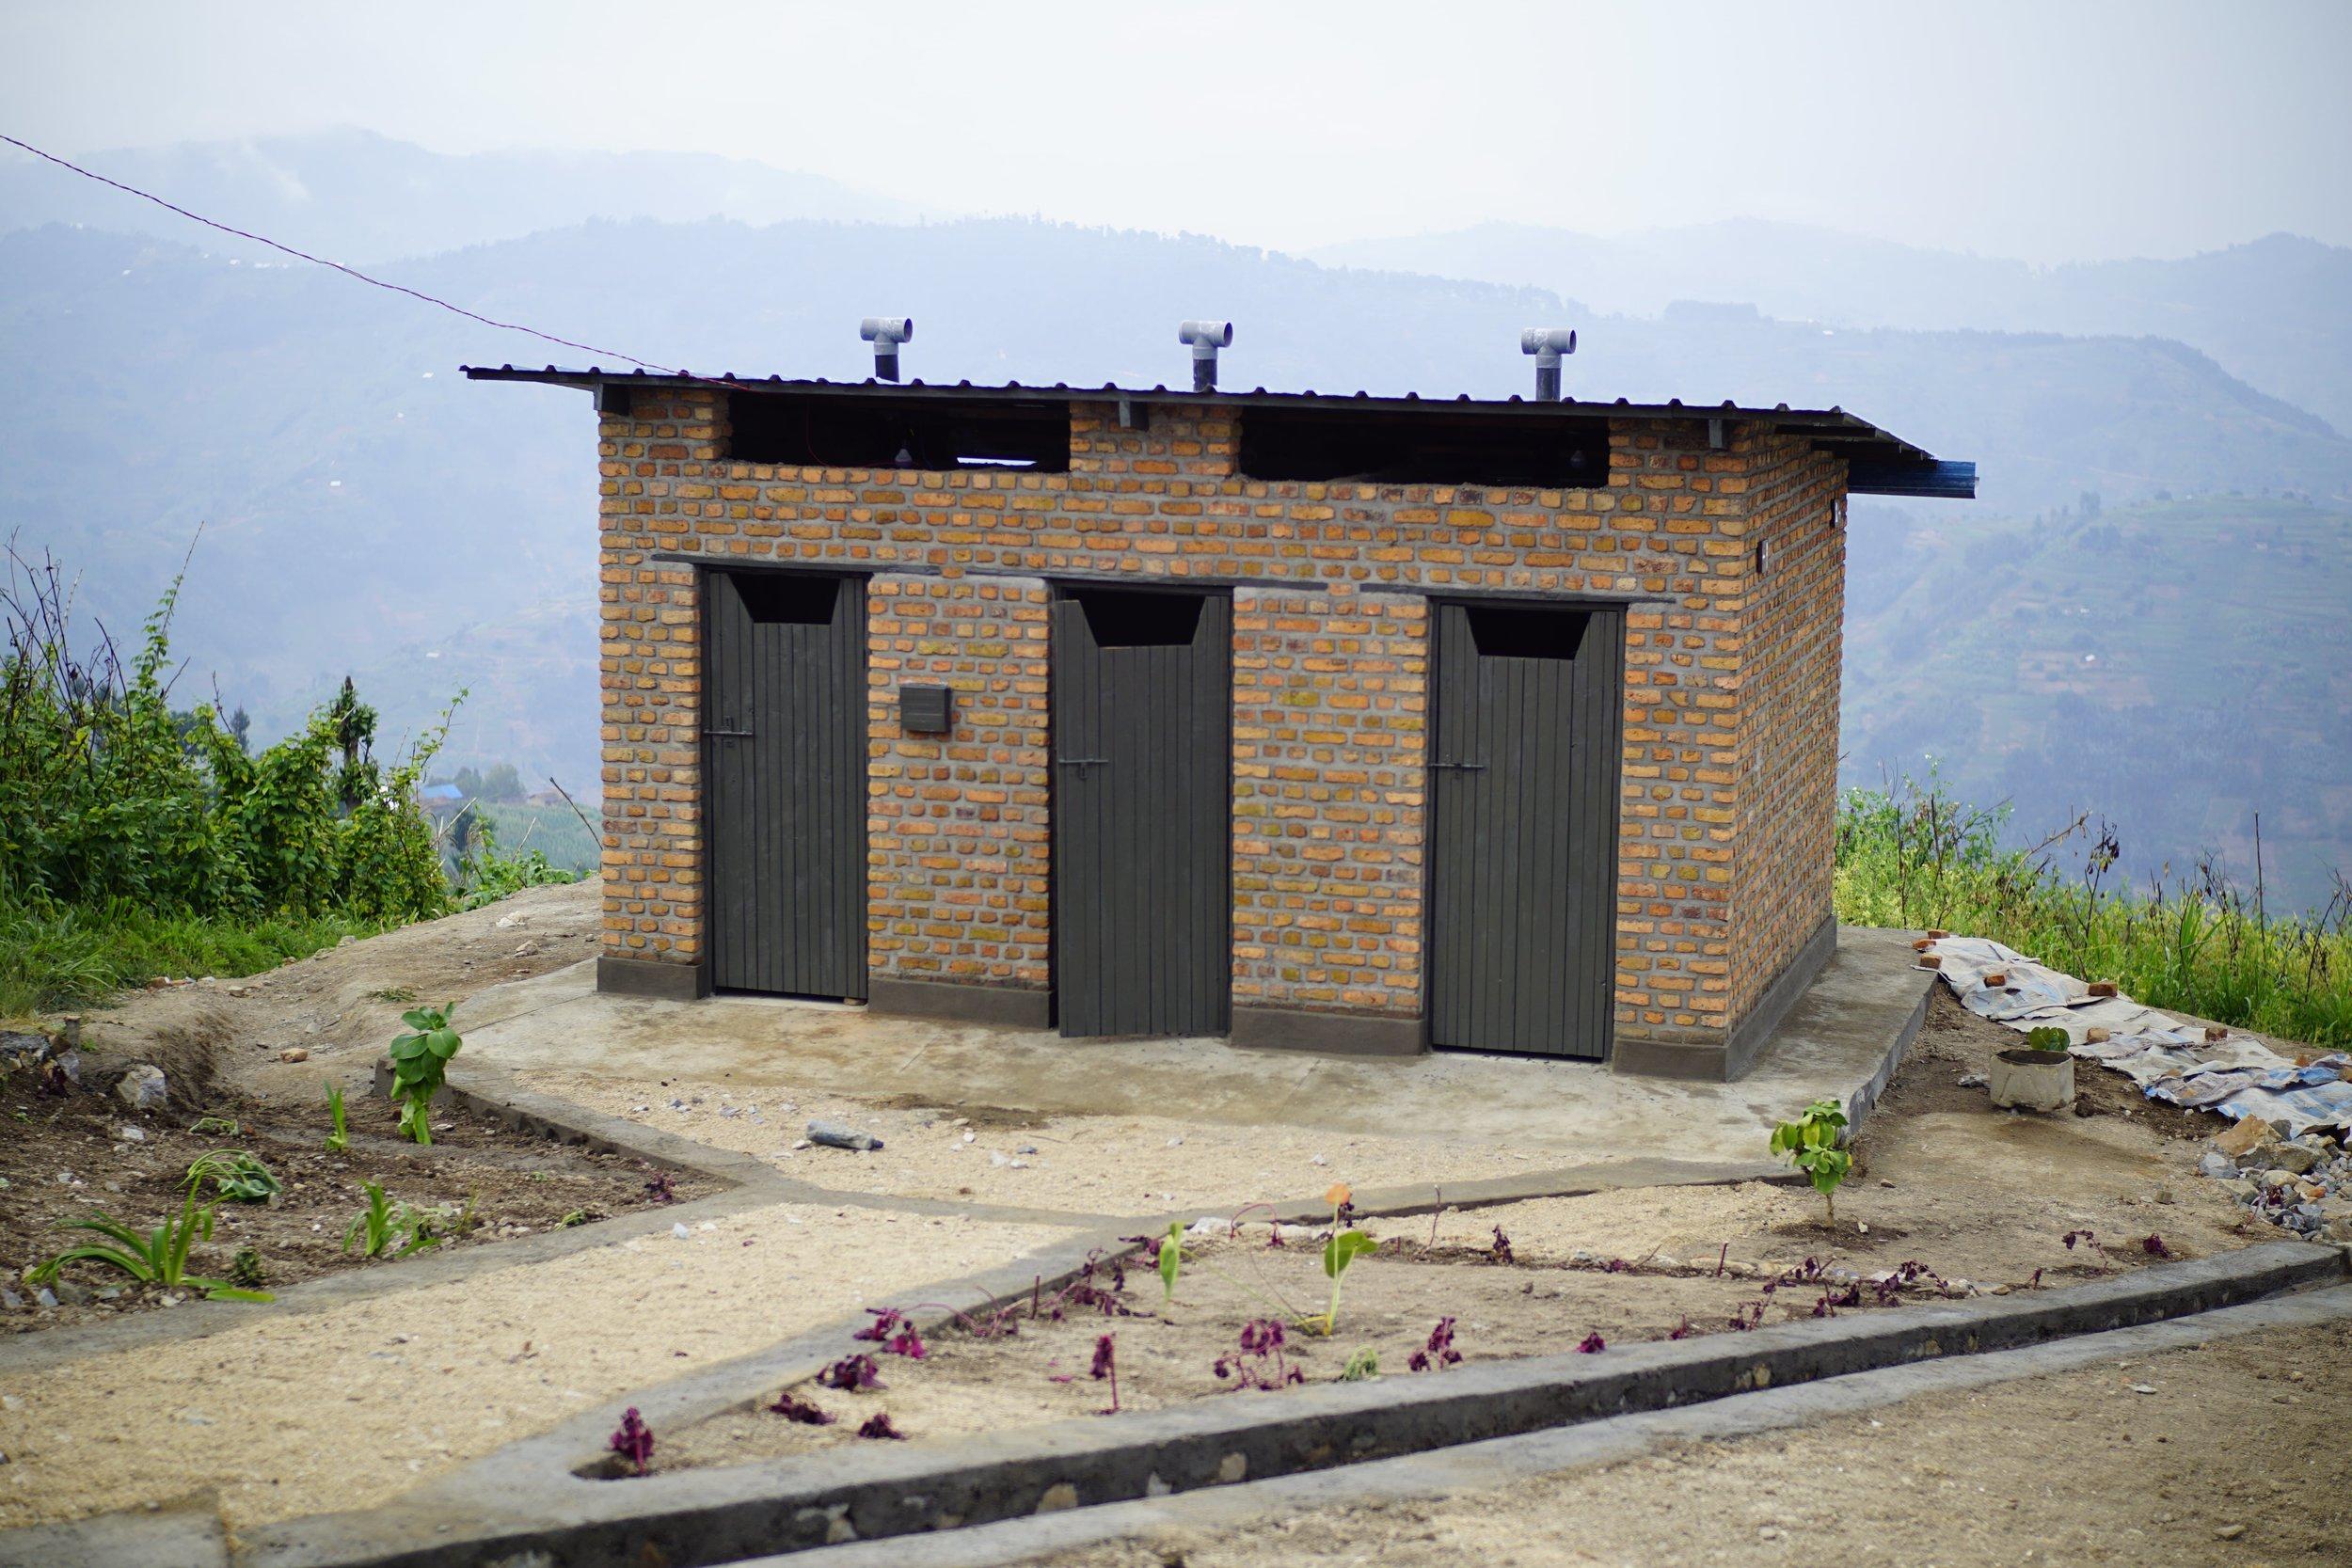 Outhouses_Testimony PRÉCI_Youth Travel Foundation